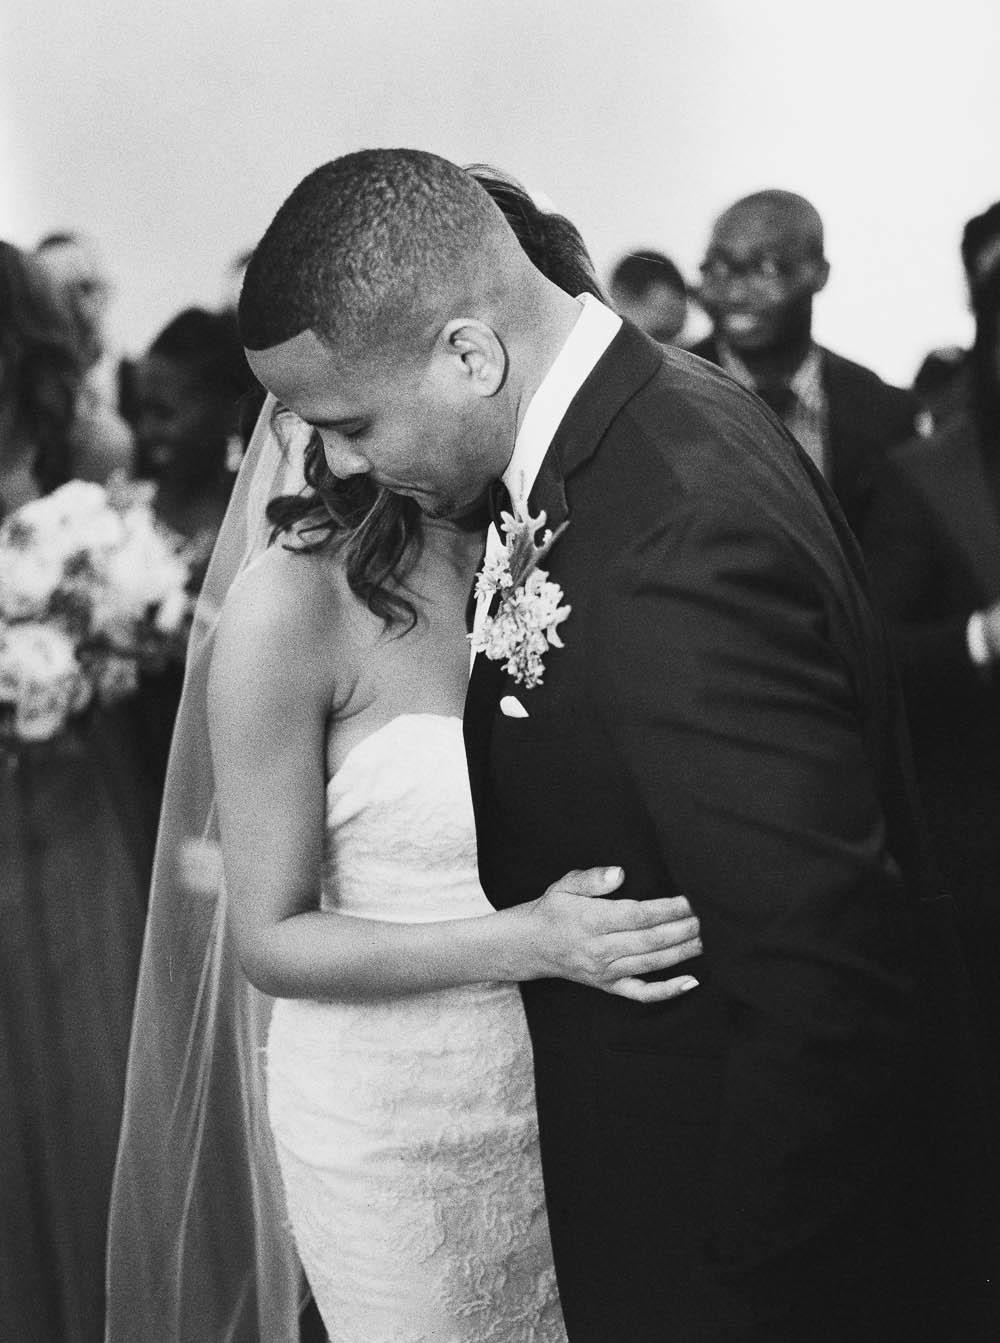 nashville ruby film documentary wedding photographer heartfelt real moments african american wedding munalachi bride ©2016abigailbobophotography-44.jpg